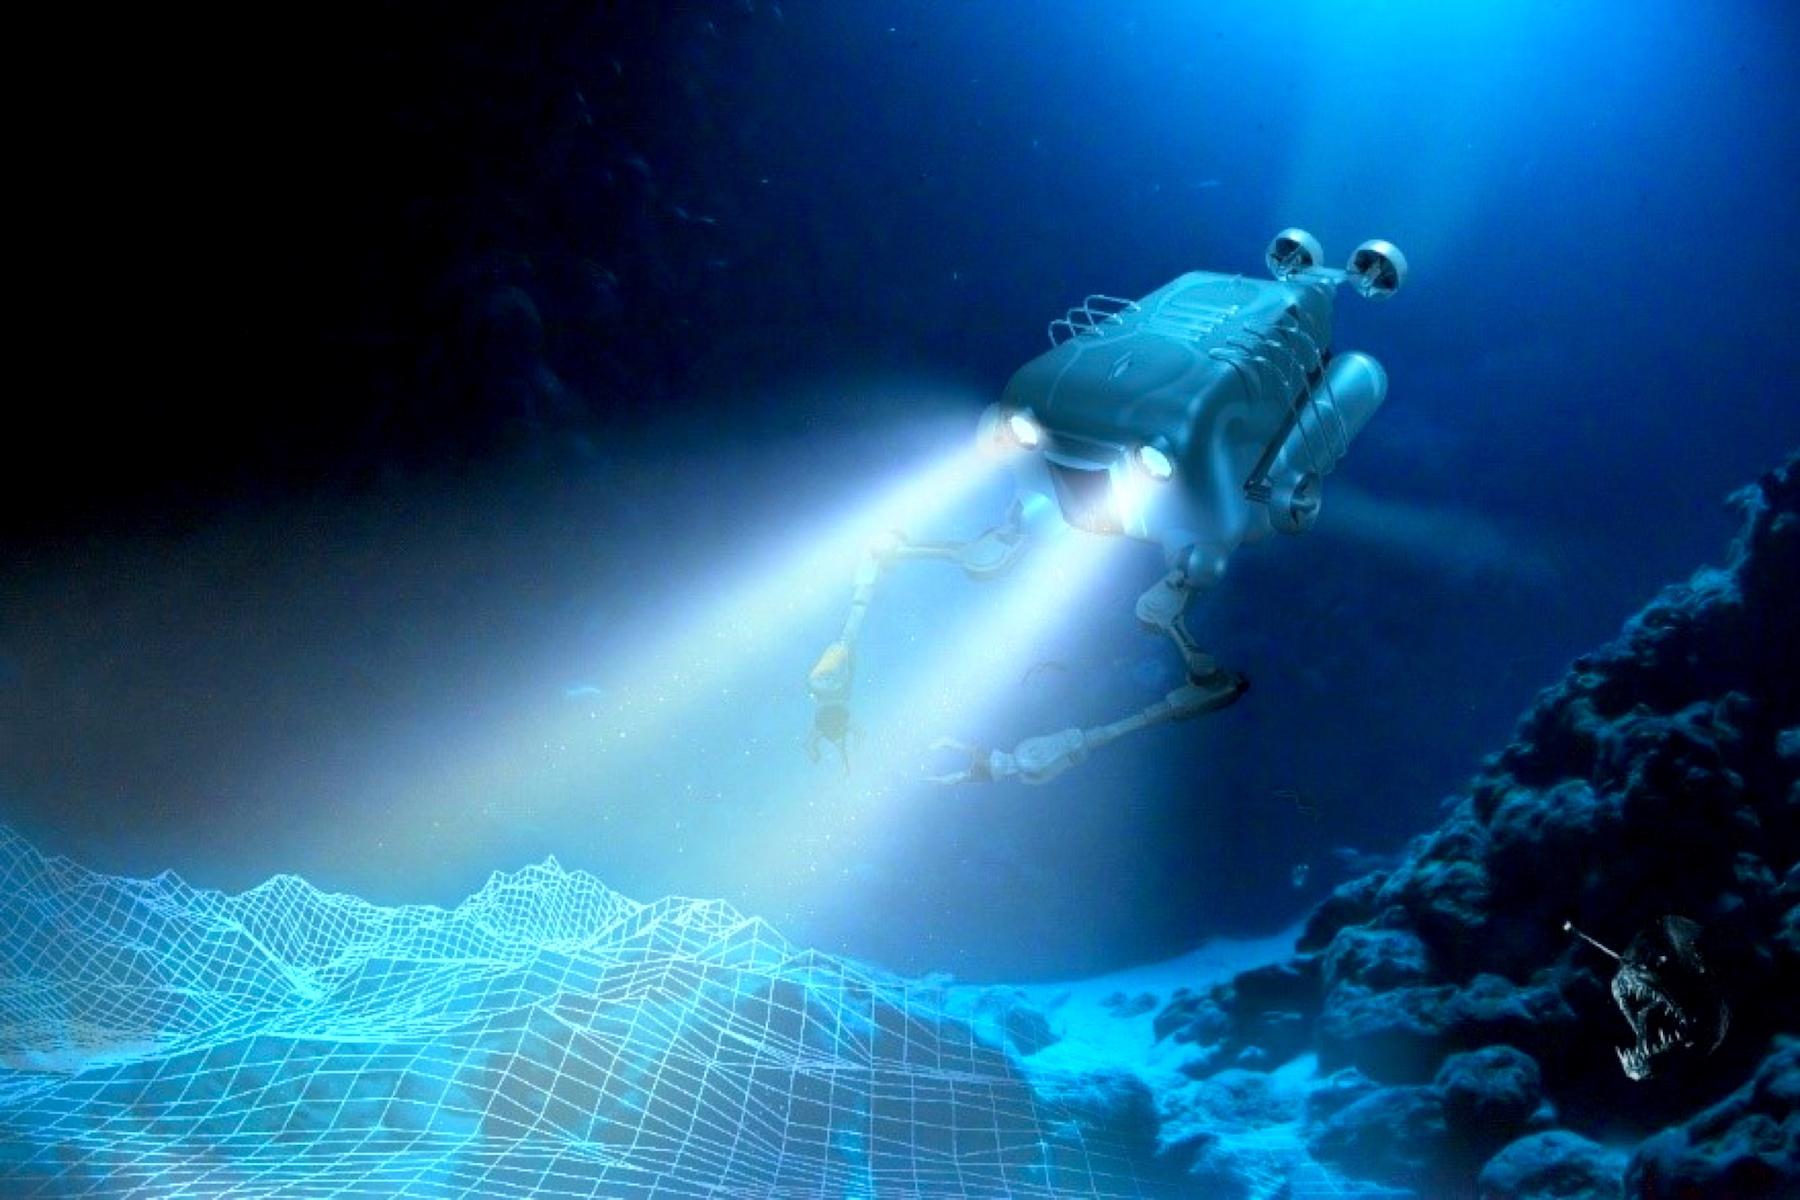 DARPA Angler UUV